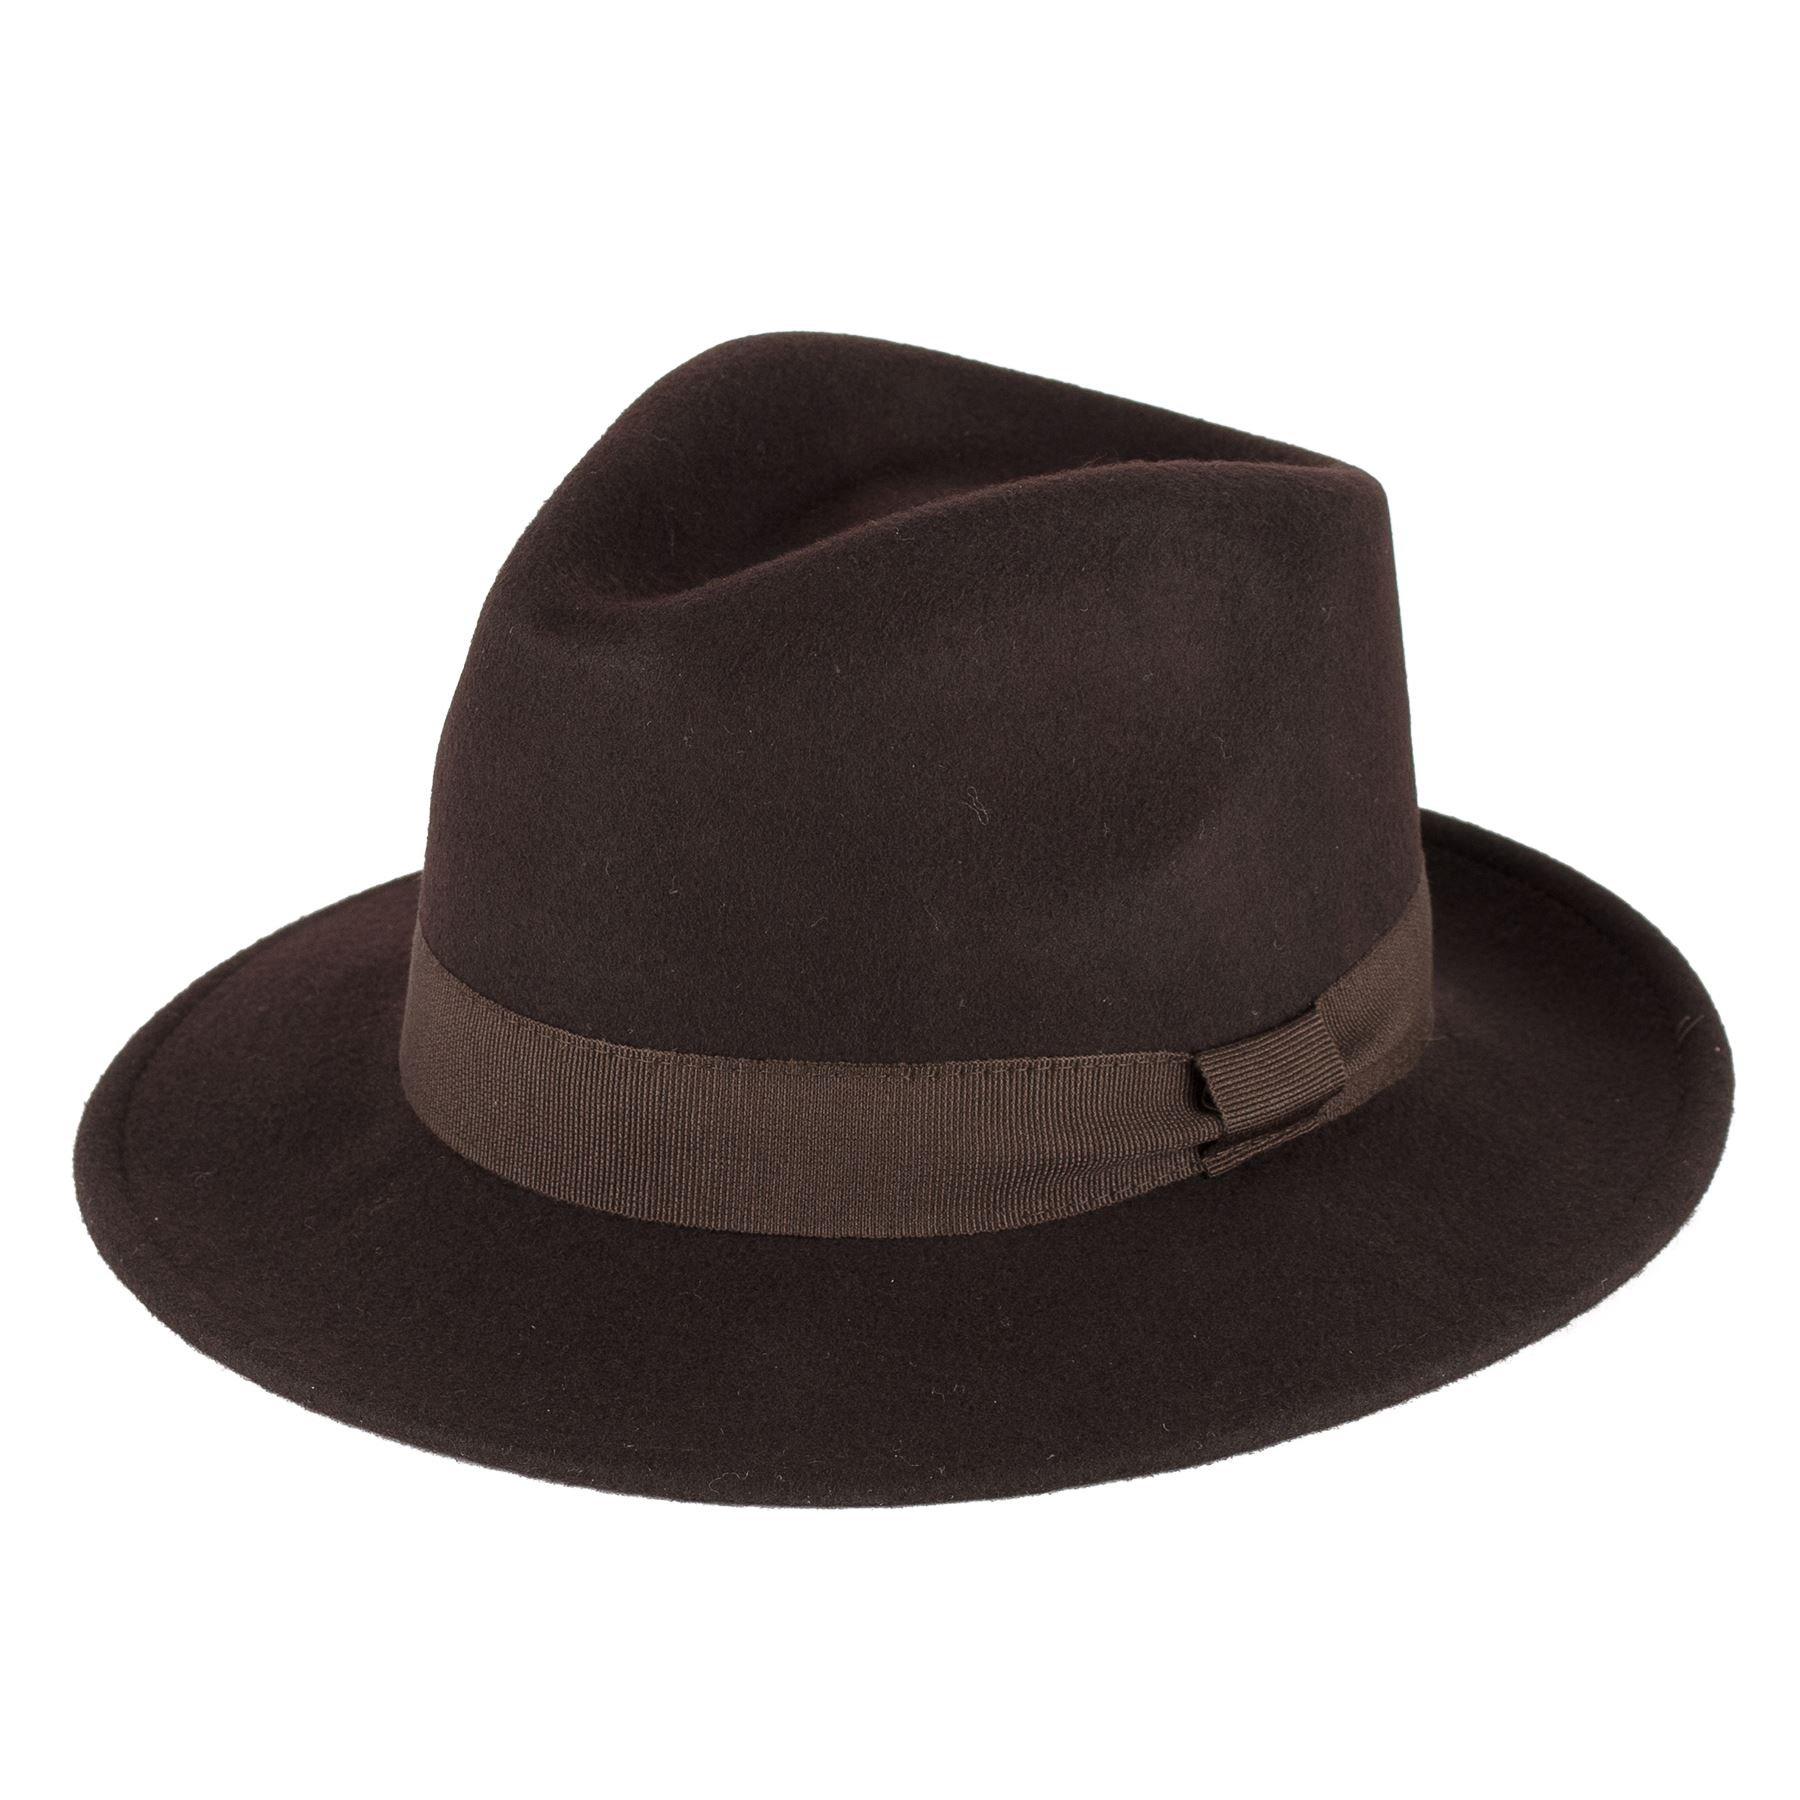 I piu votati nella categoria Cappelli Fedora da uomo   recensioni ... faeb20a26f15